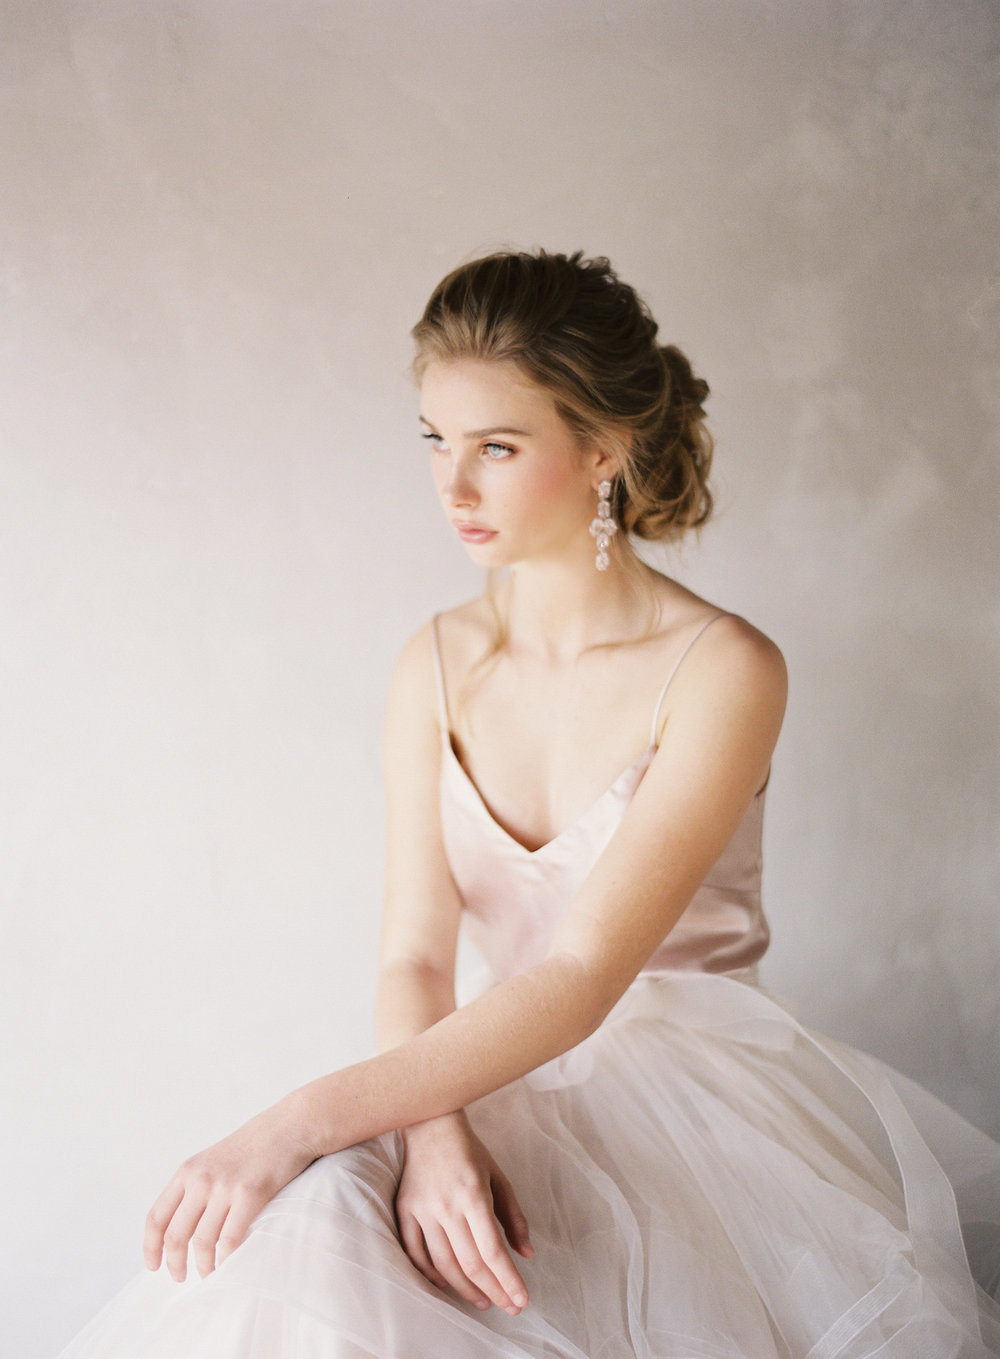 Classic-Bridal-Portraits-209-Jen_Huang-BHLDN-Winter-Bride-46-Jen_Huang-008659-R1-001.jpg